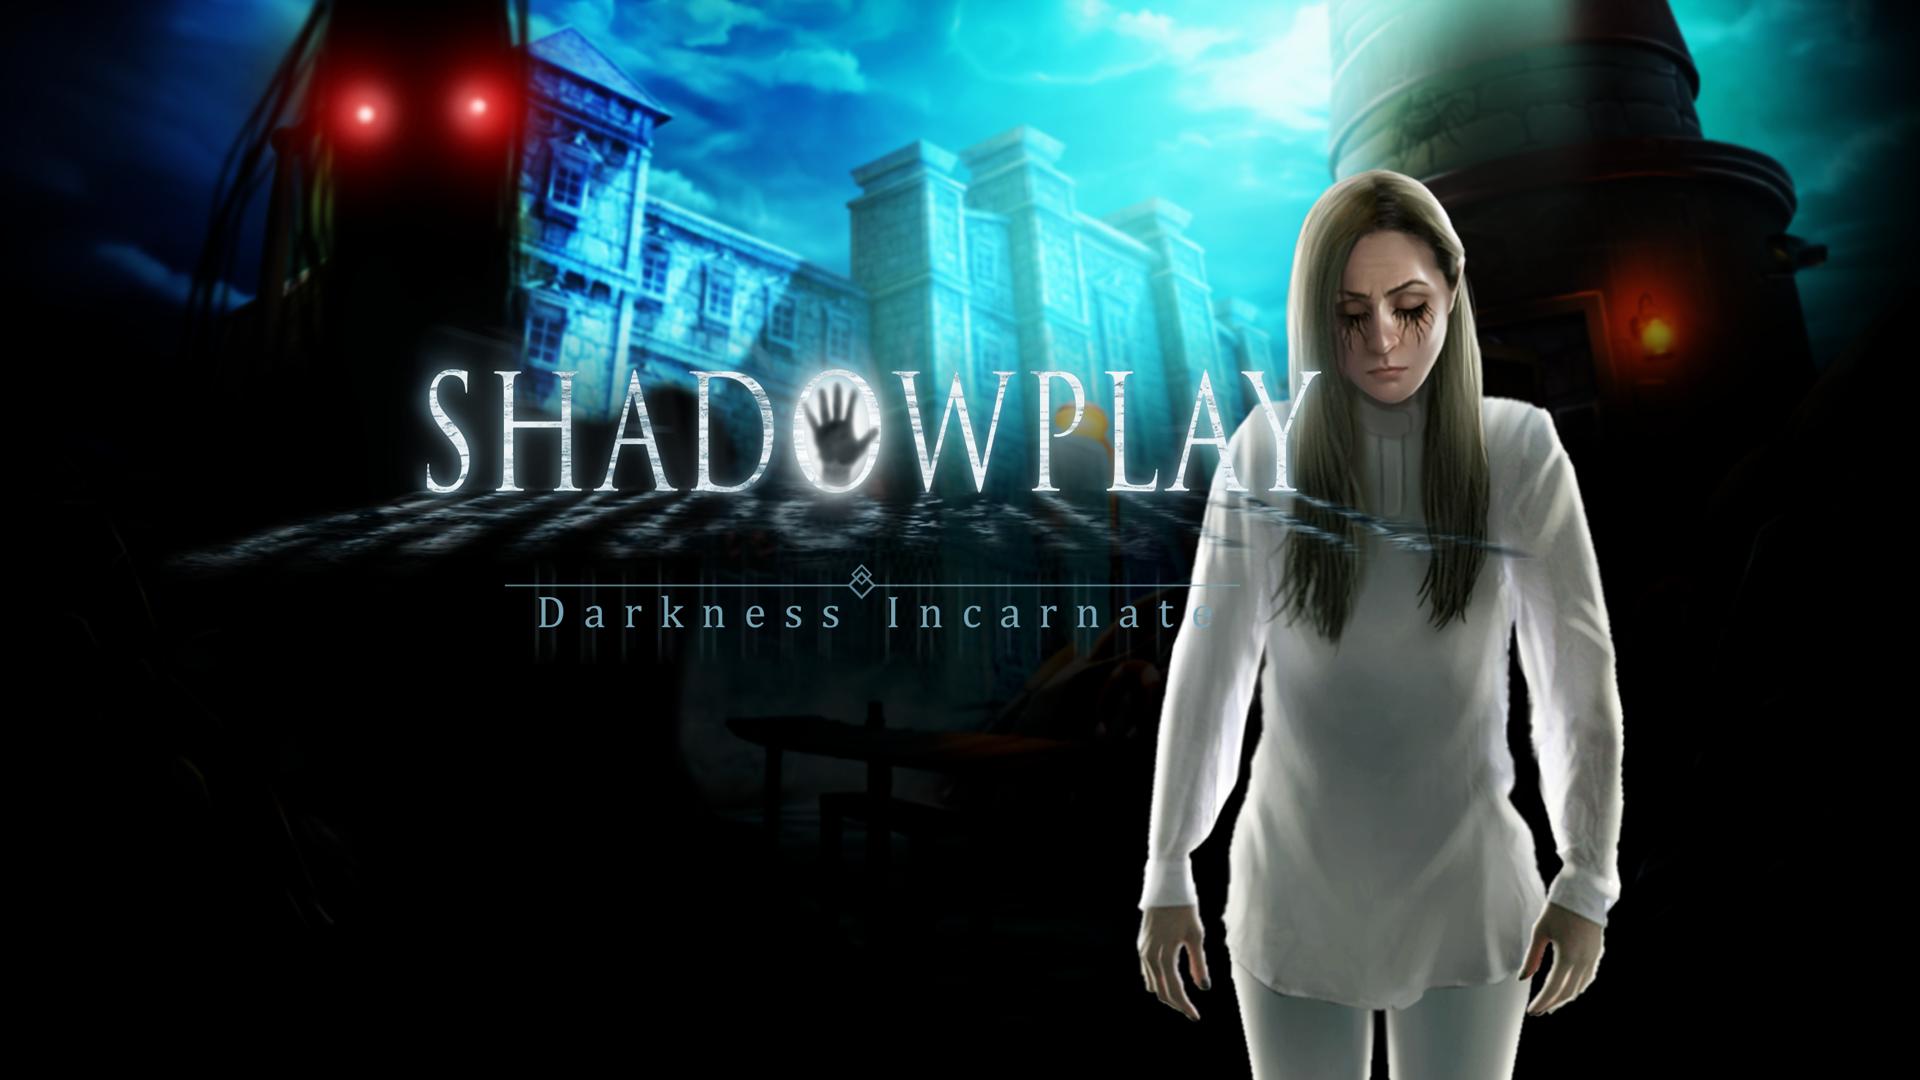 shadowplay download windows 10